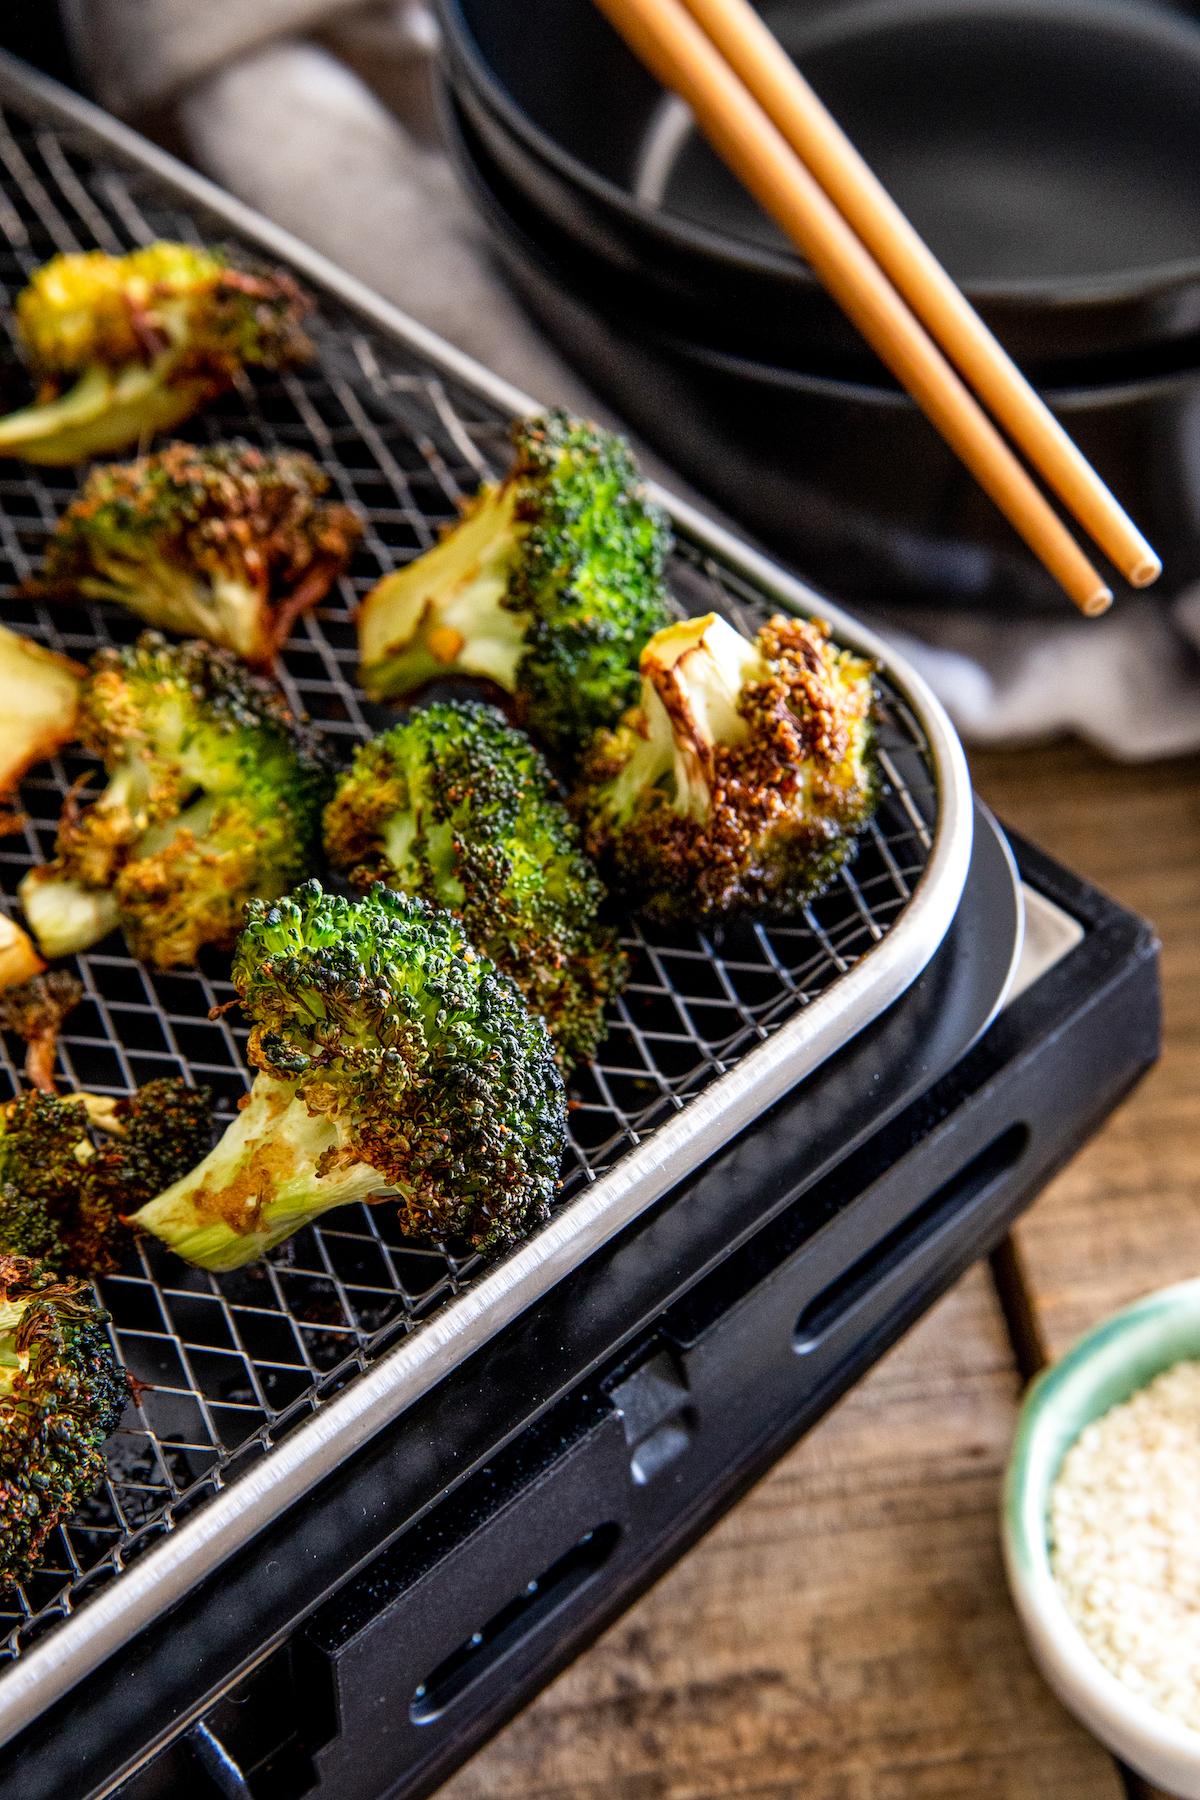 Roasted broccoli on an air fryer tray.